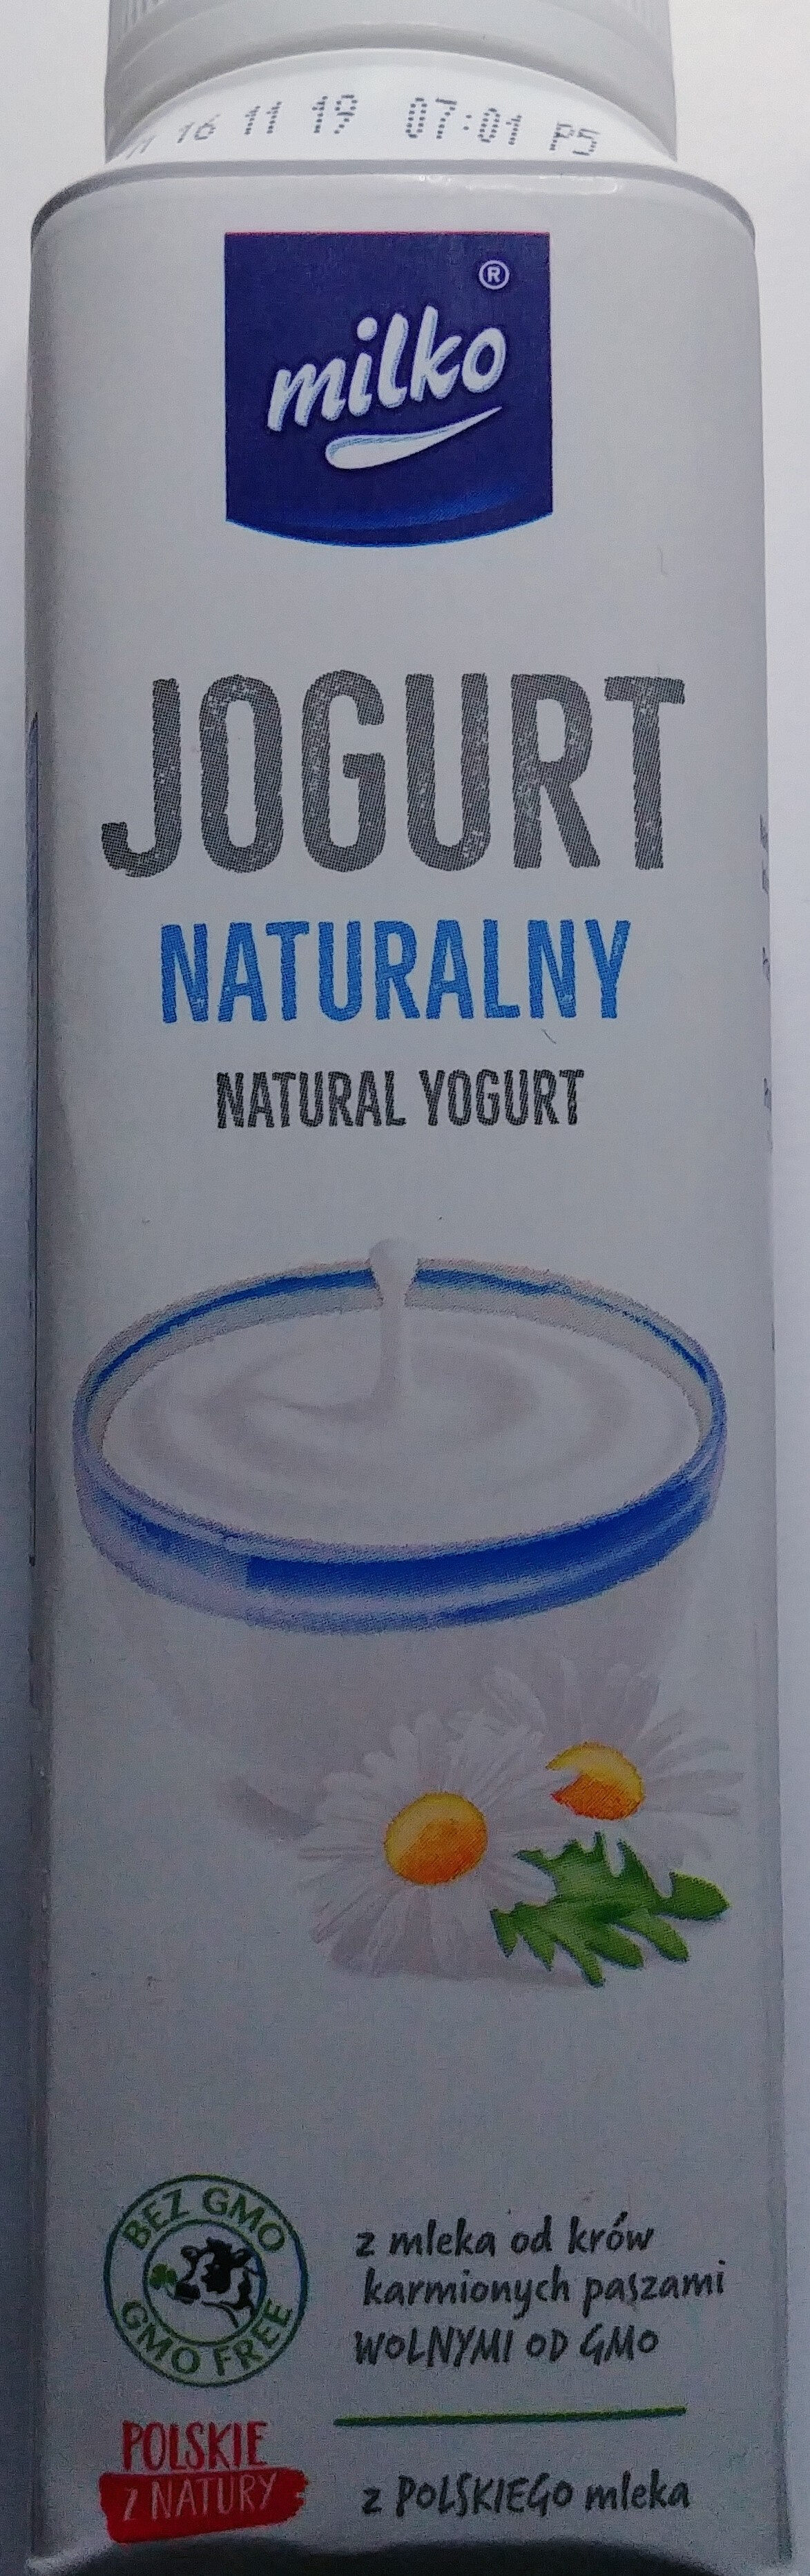 Jogurt naturalny - Produkt